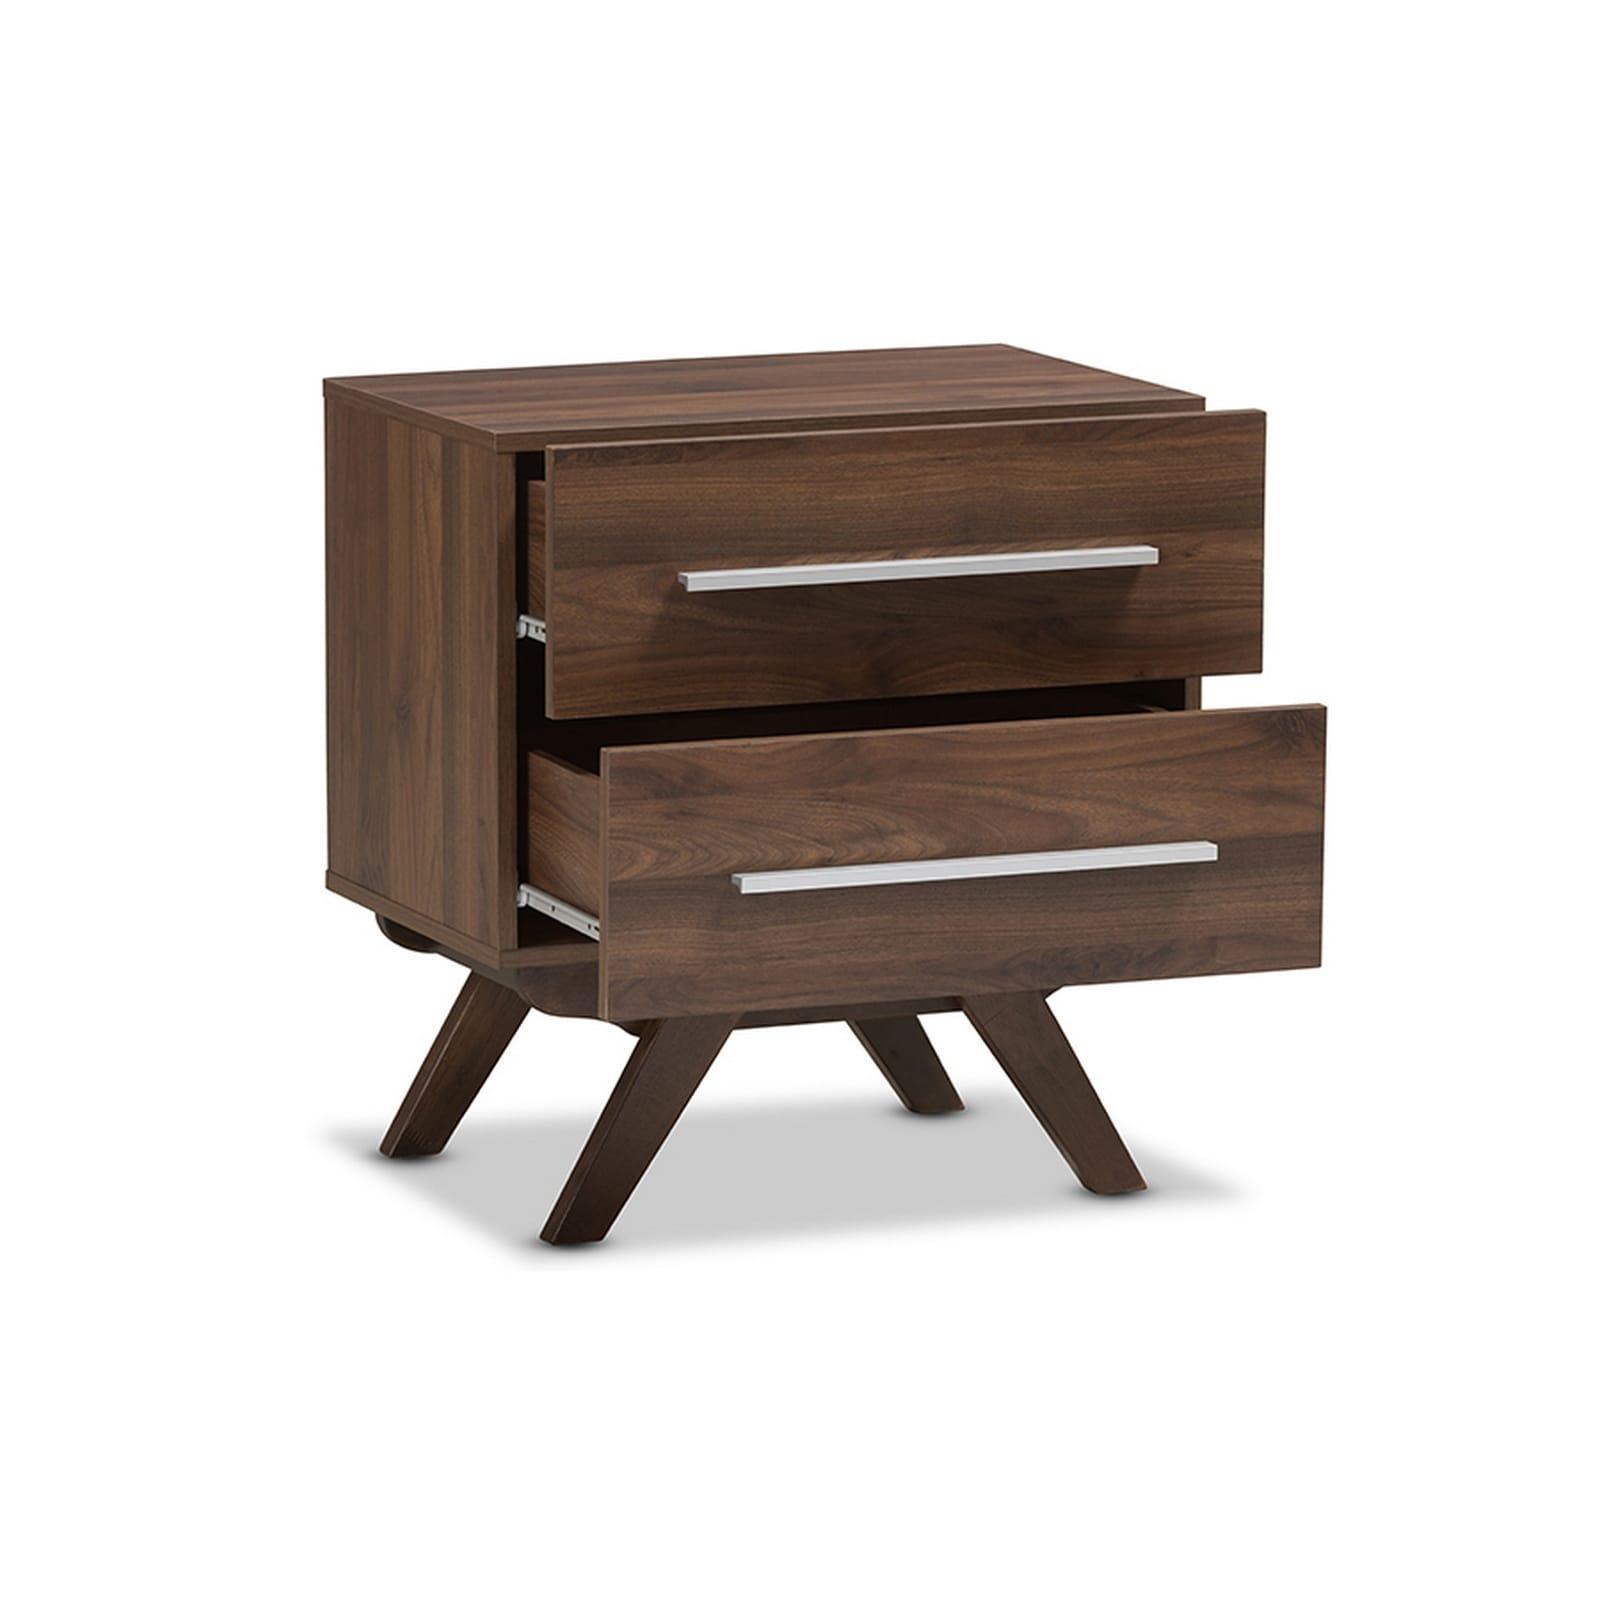 Night Stand Designs : Urban designs auburn mid century walnut brown finished wood